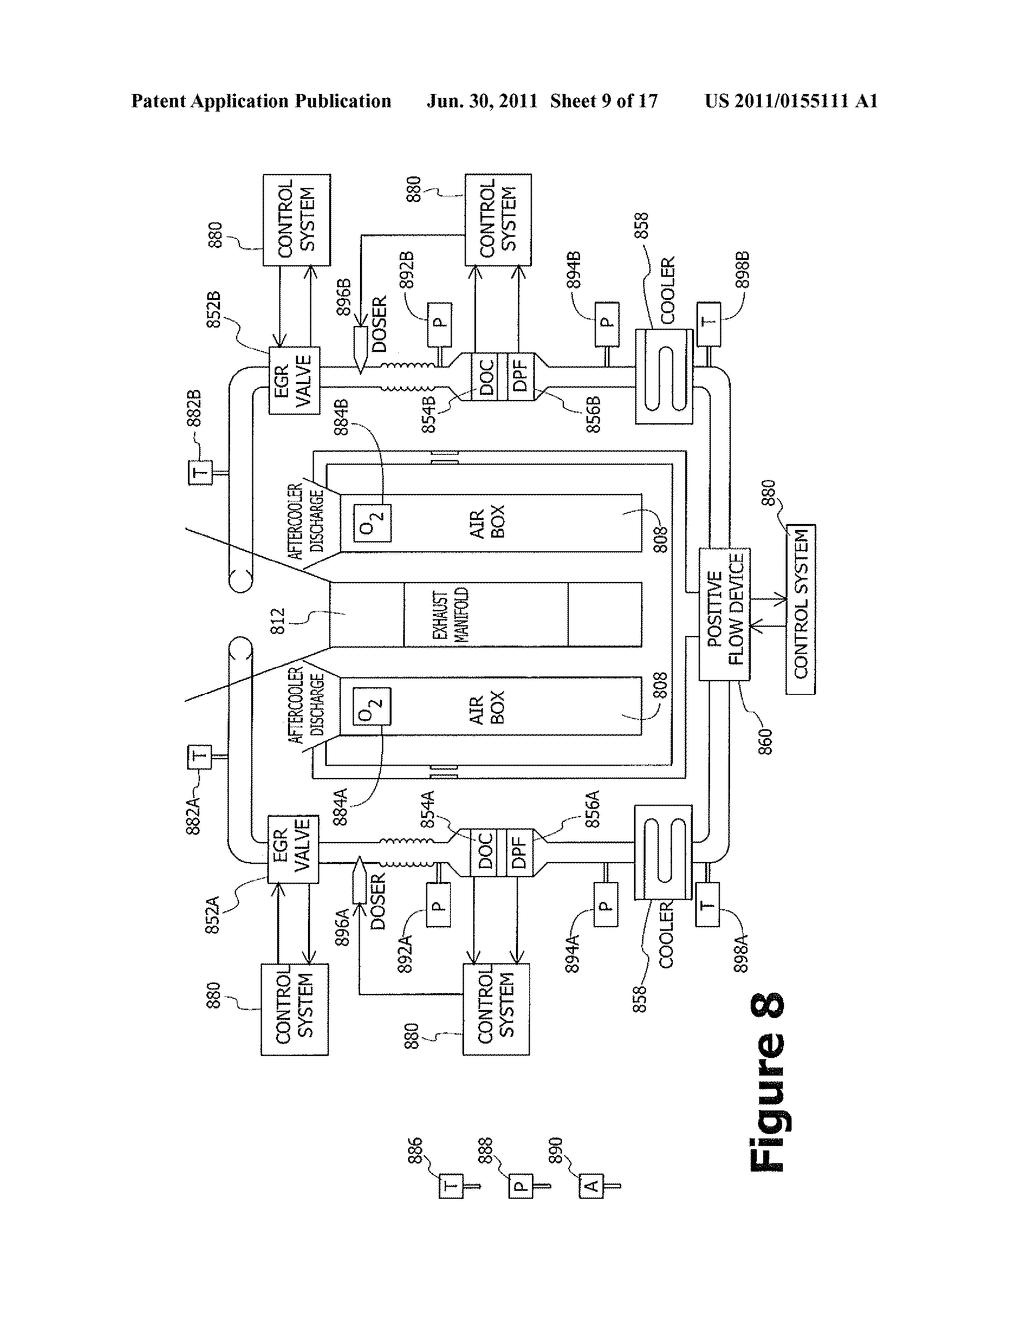 Kasea Dune Buggy Wiring Diagram John Deere Wiring Harness Diagram ...